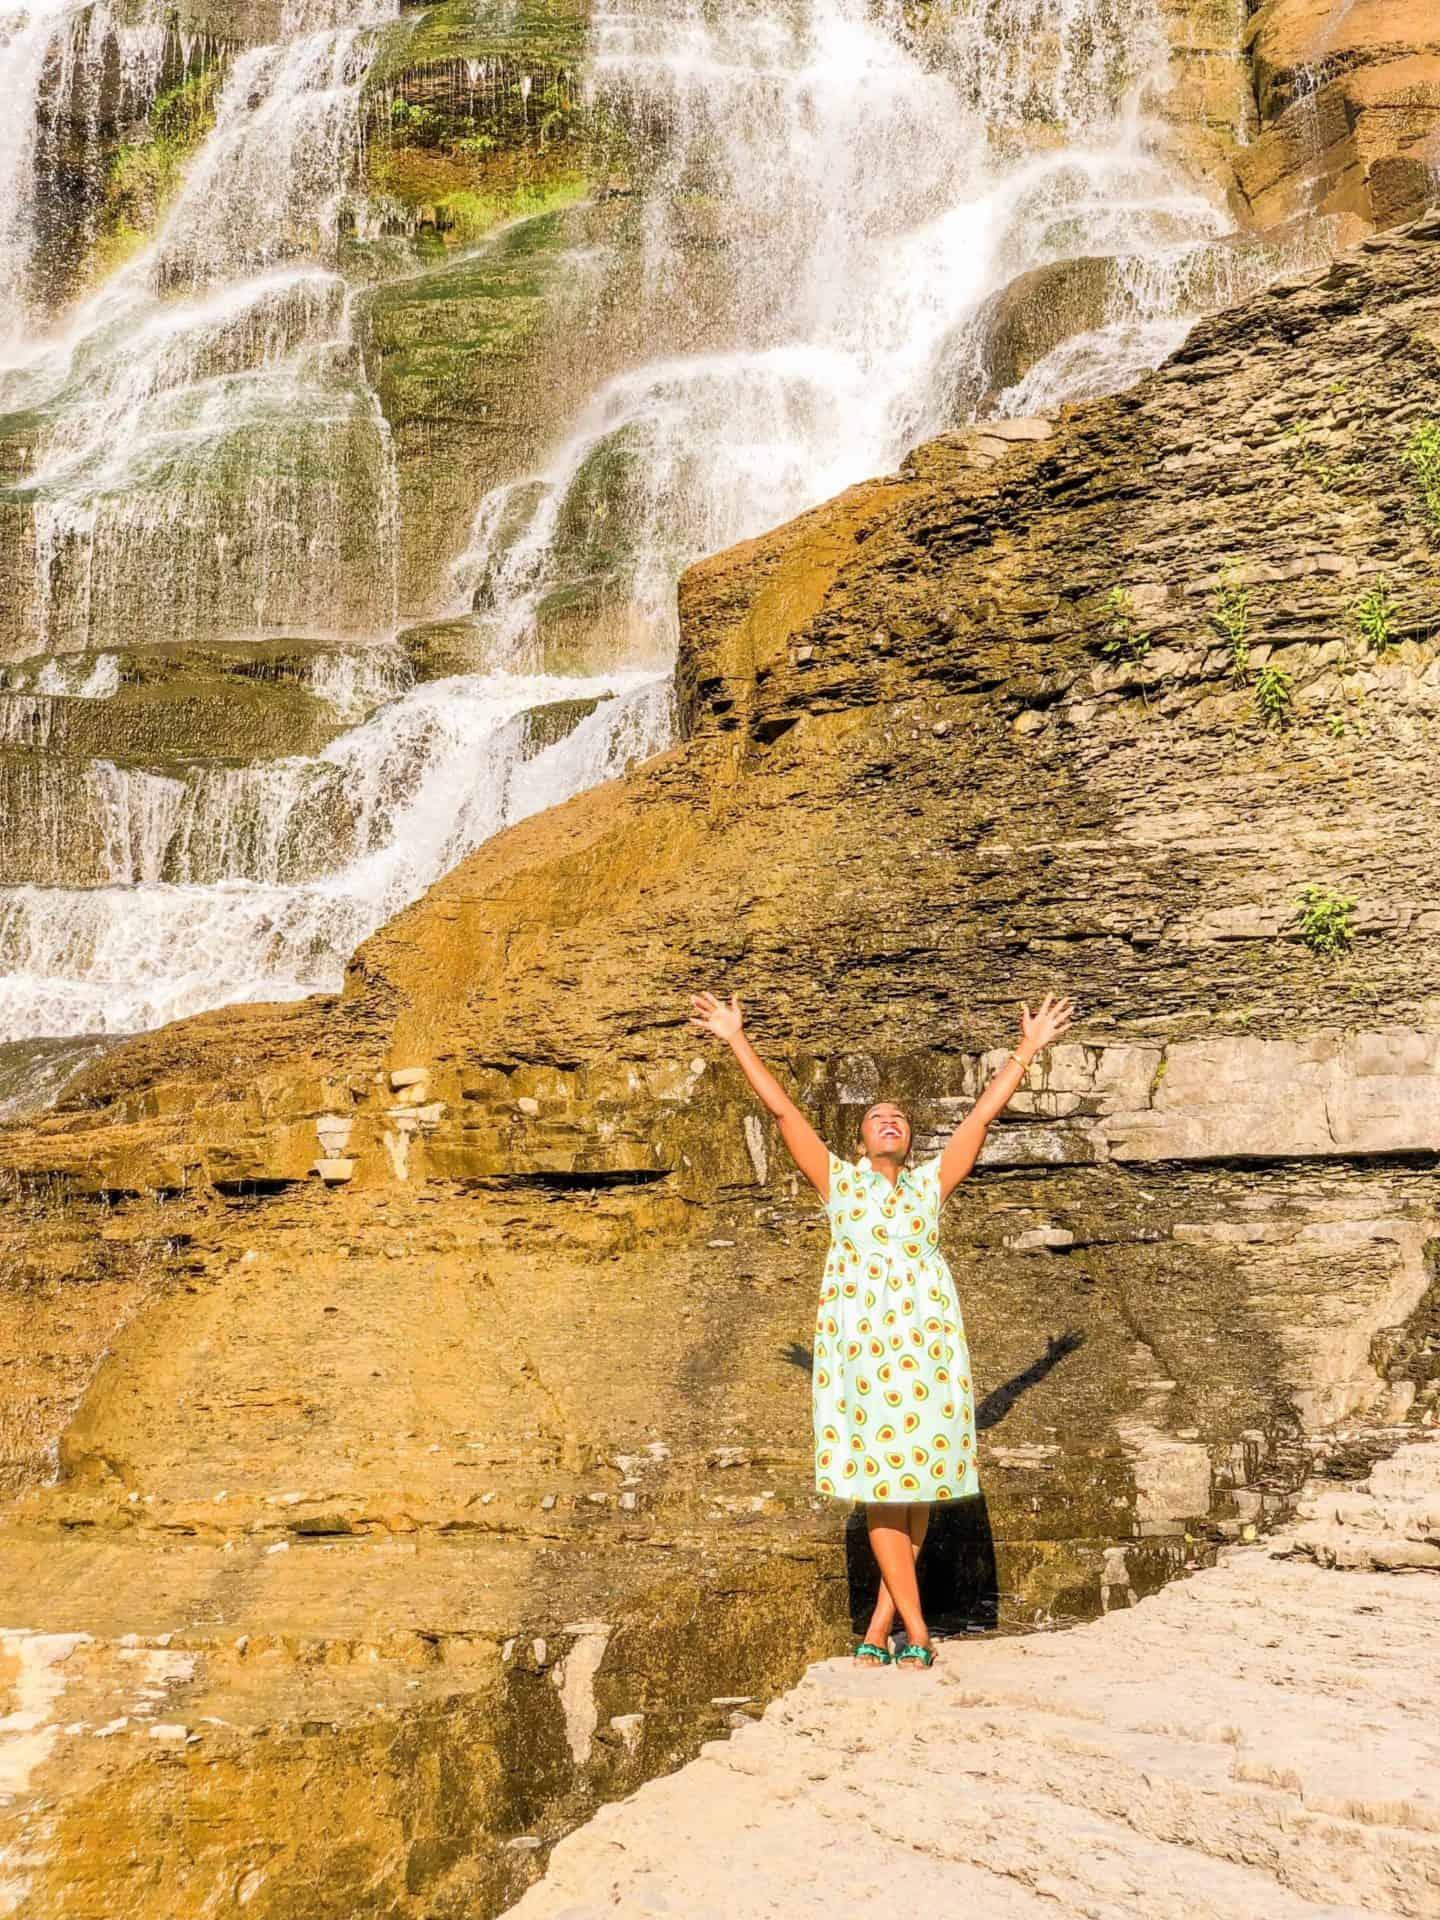 Shaunda Necole- Don't Go Chasing Waterfalls